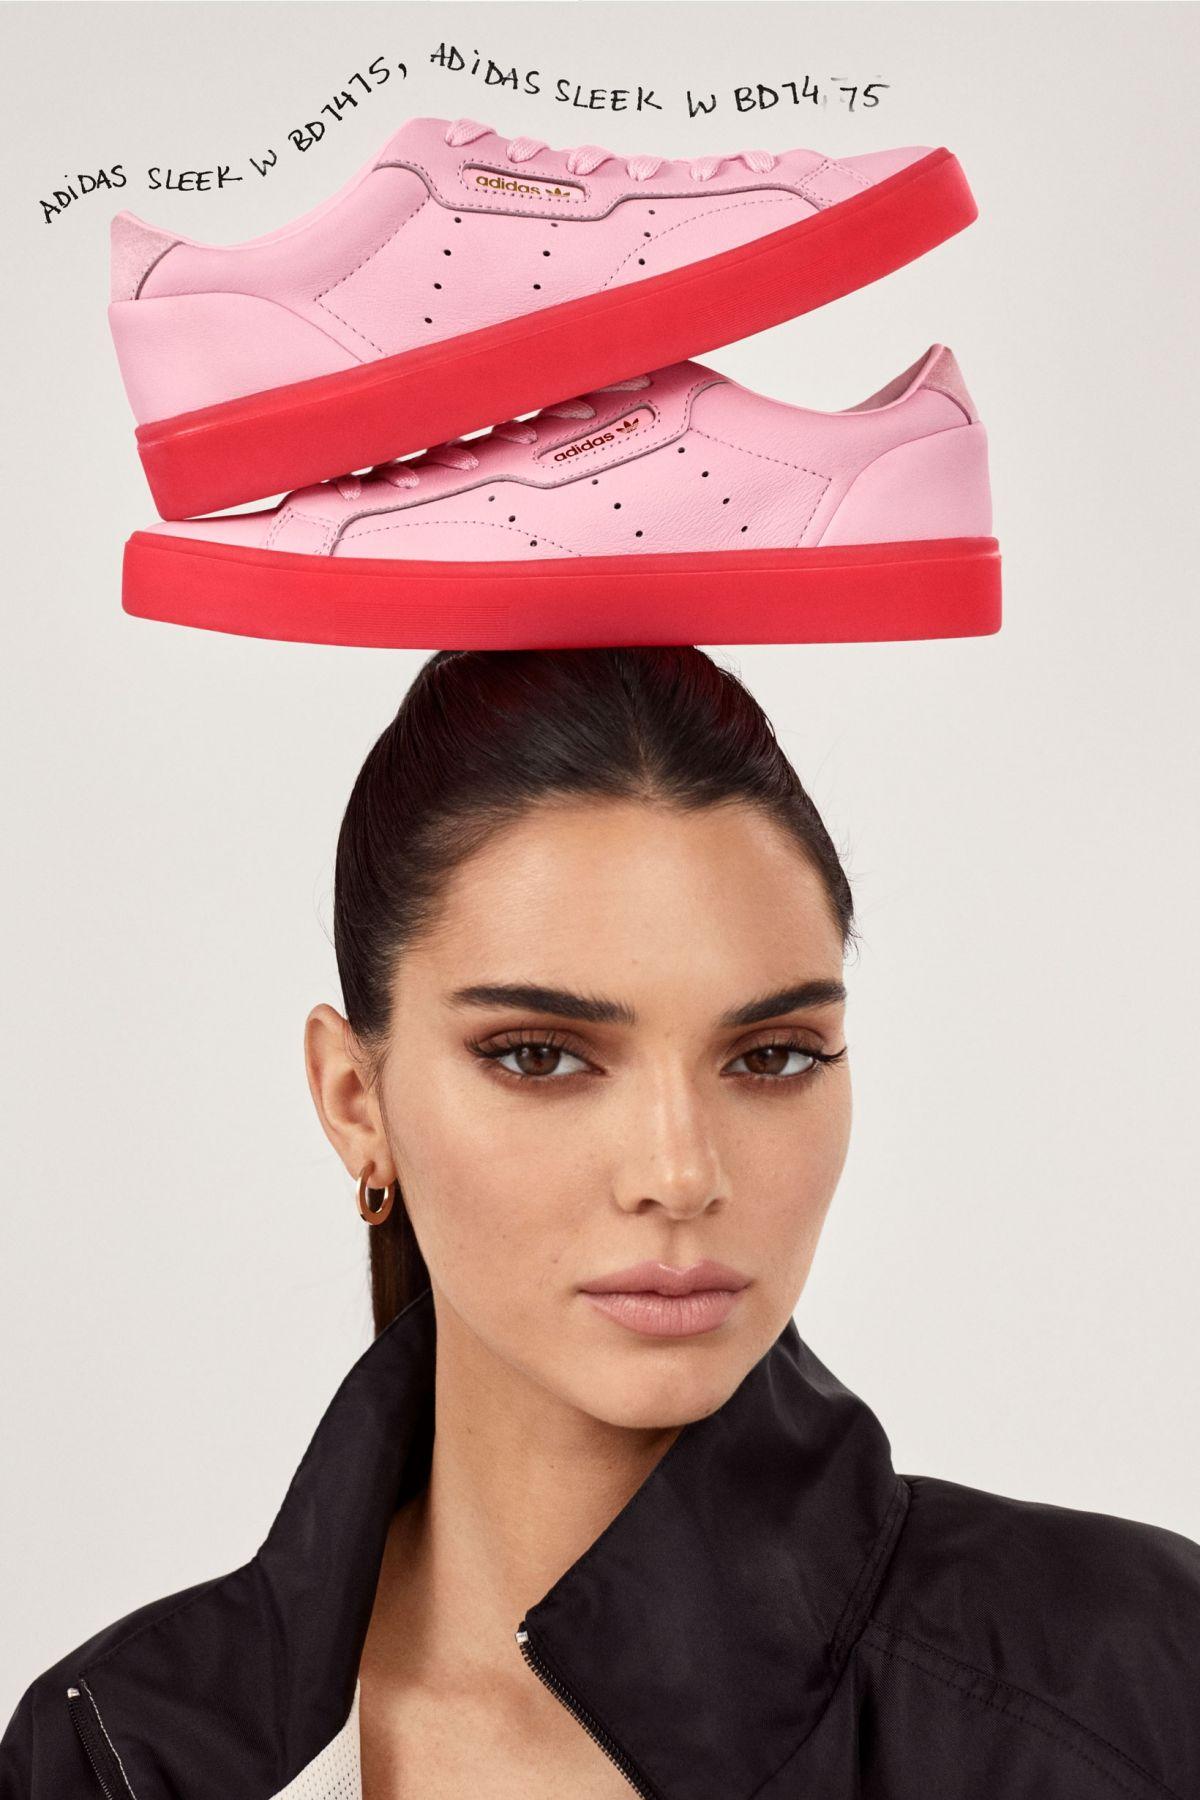 c335617c5d11c KENDALL JENNER for Adidas New Sleek Lookbook